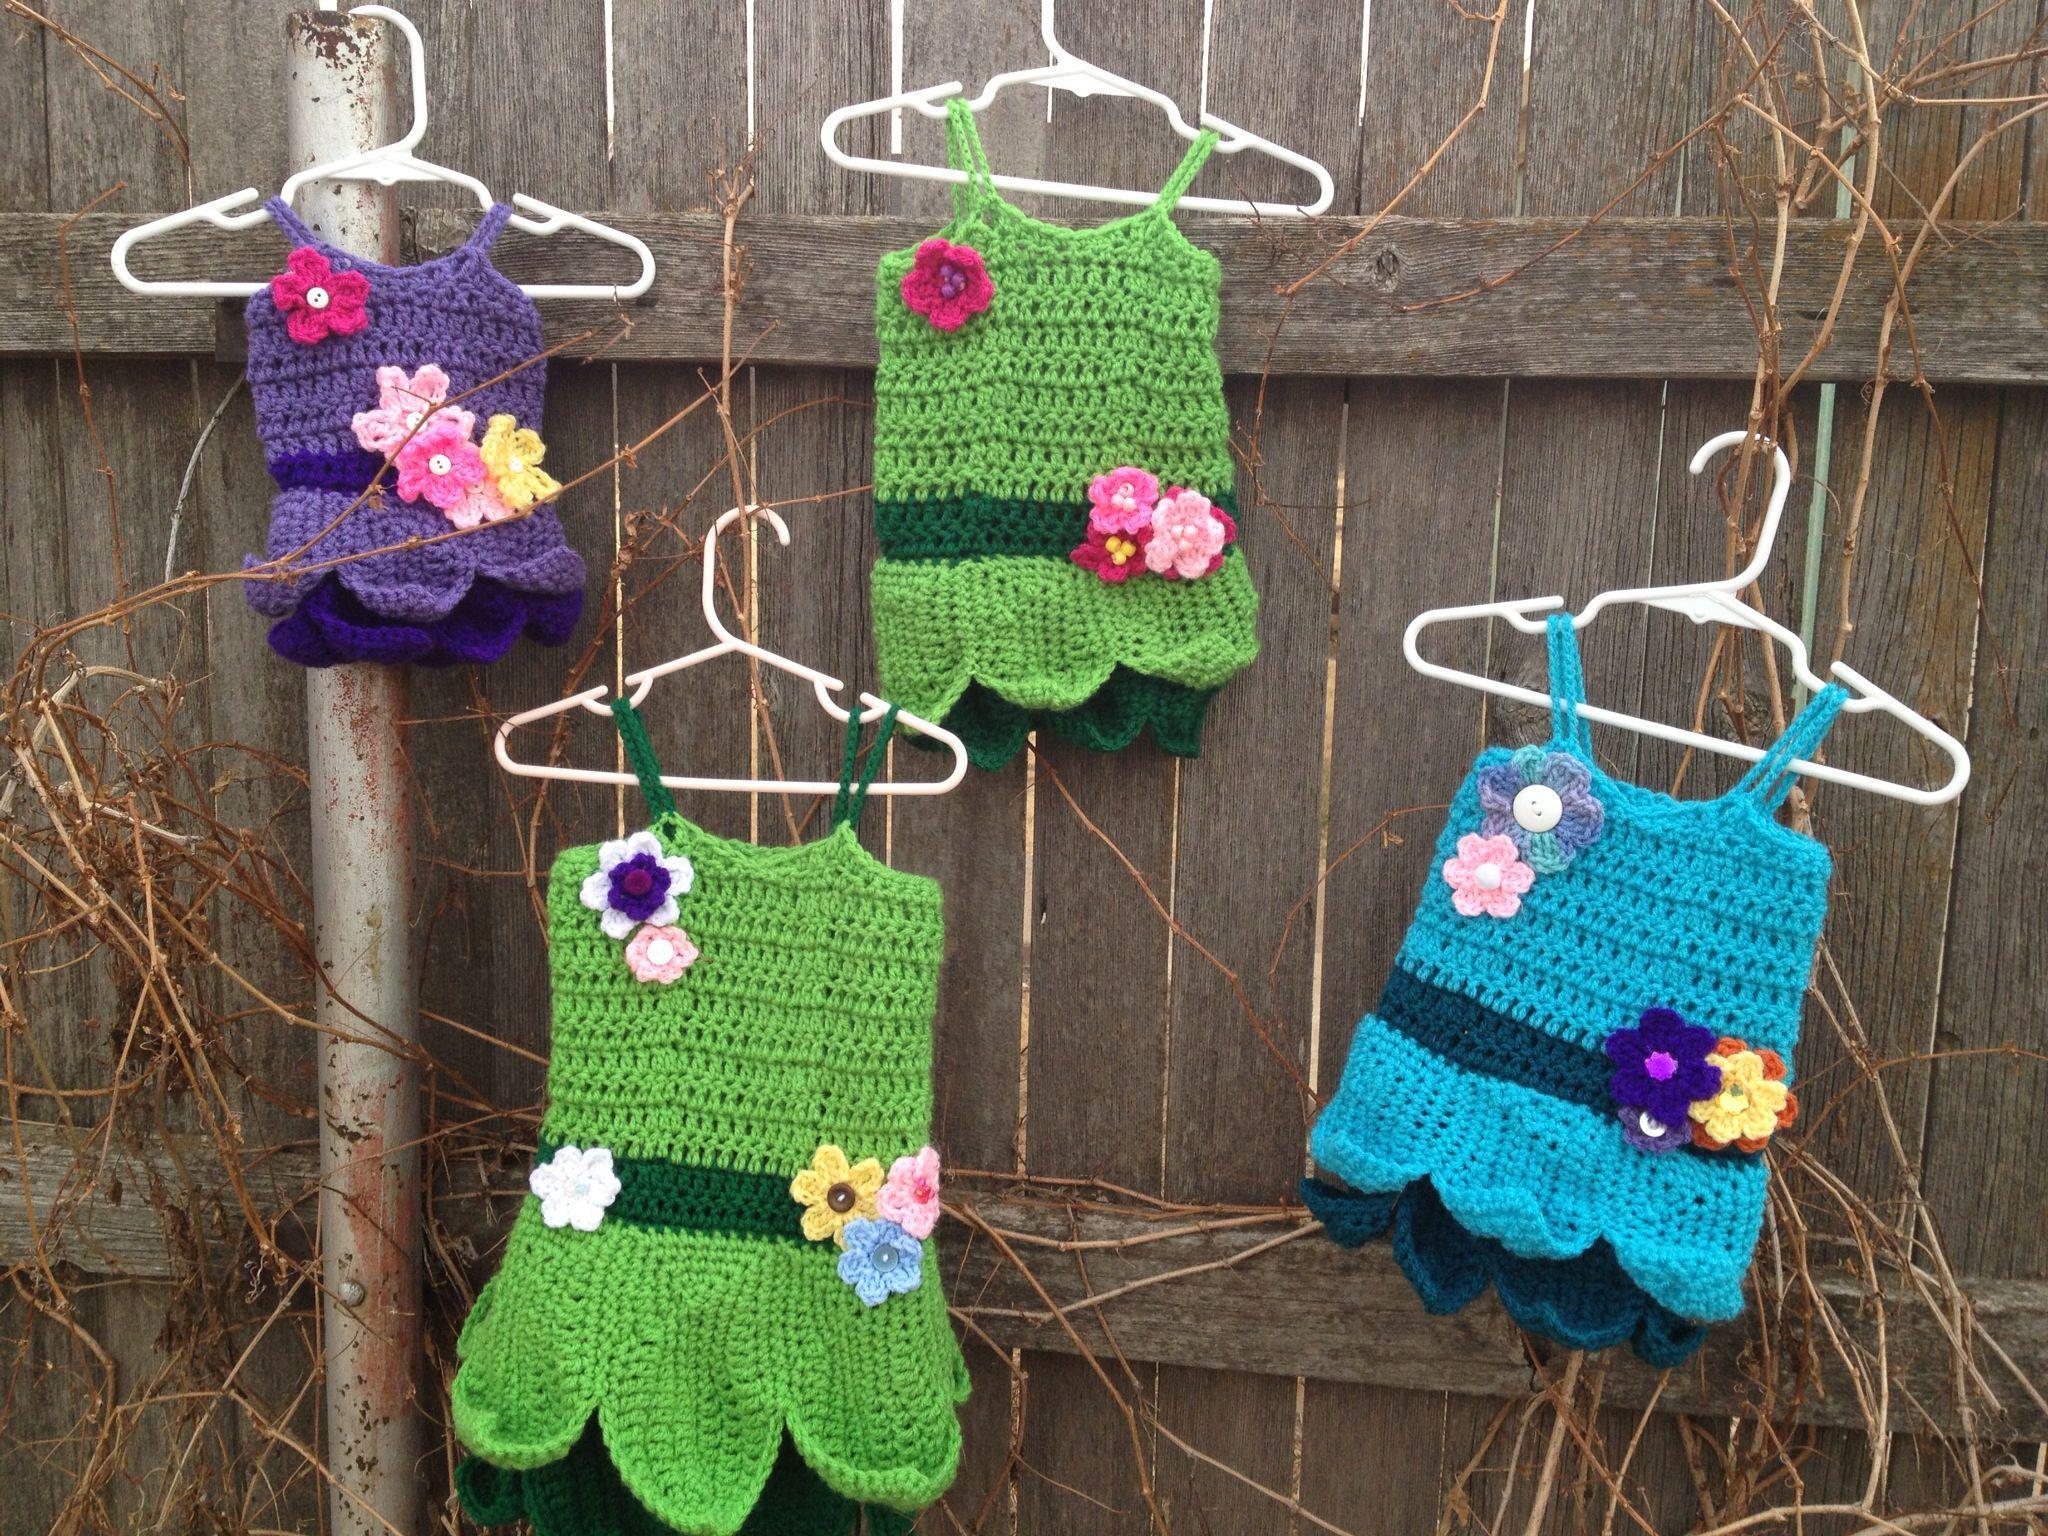 Crochet Disney Princess Inspired Dresses Testing In Progress